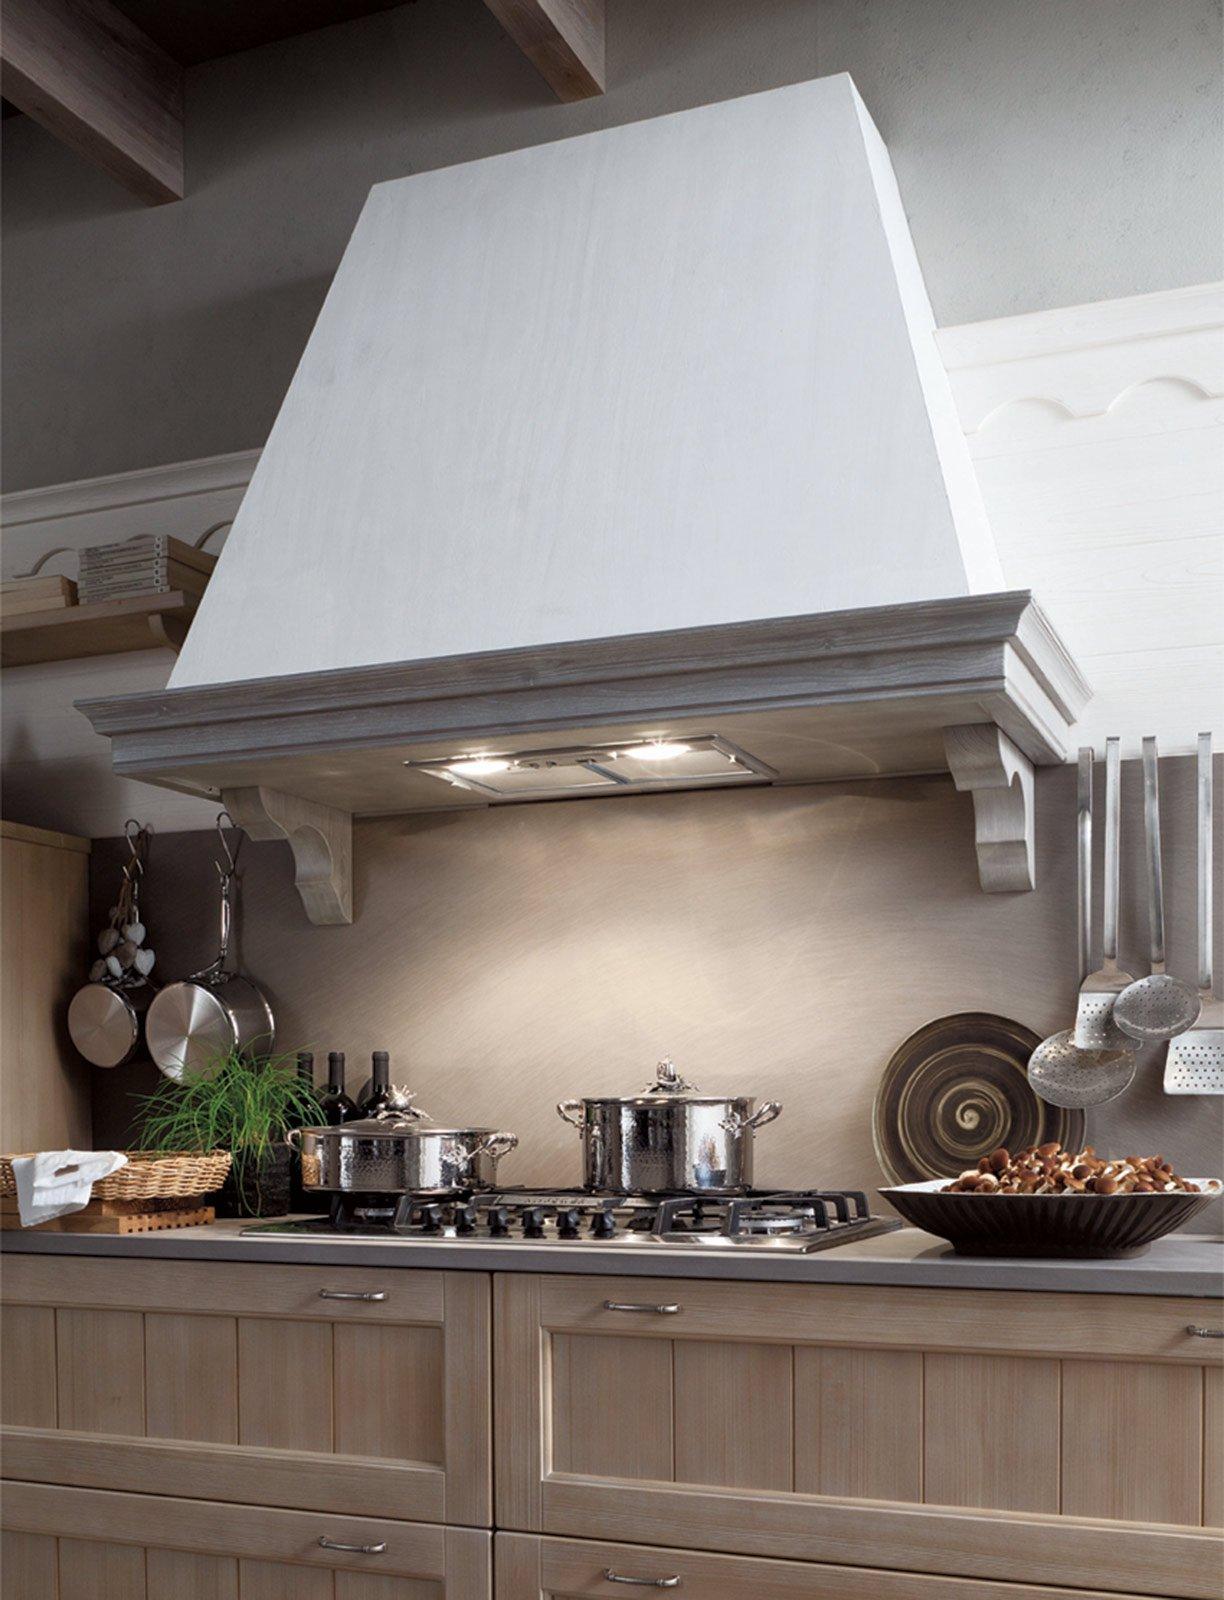 Cucina tante soluzioni per illuminarla cose di casa - Motore aspirante per cappa cucina ...